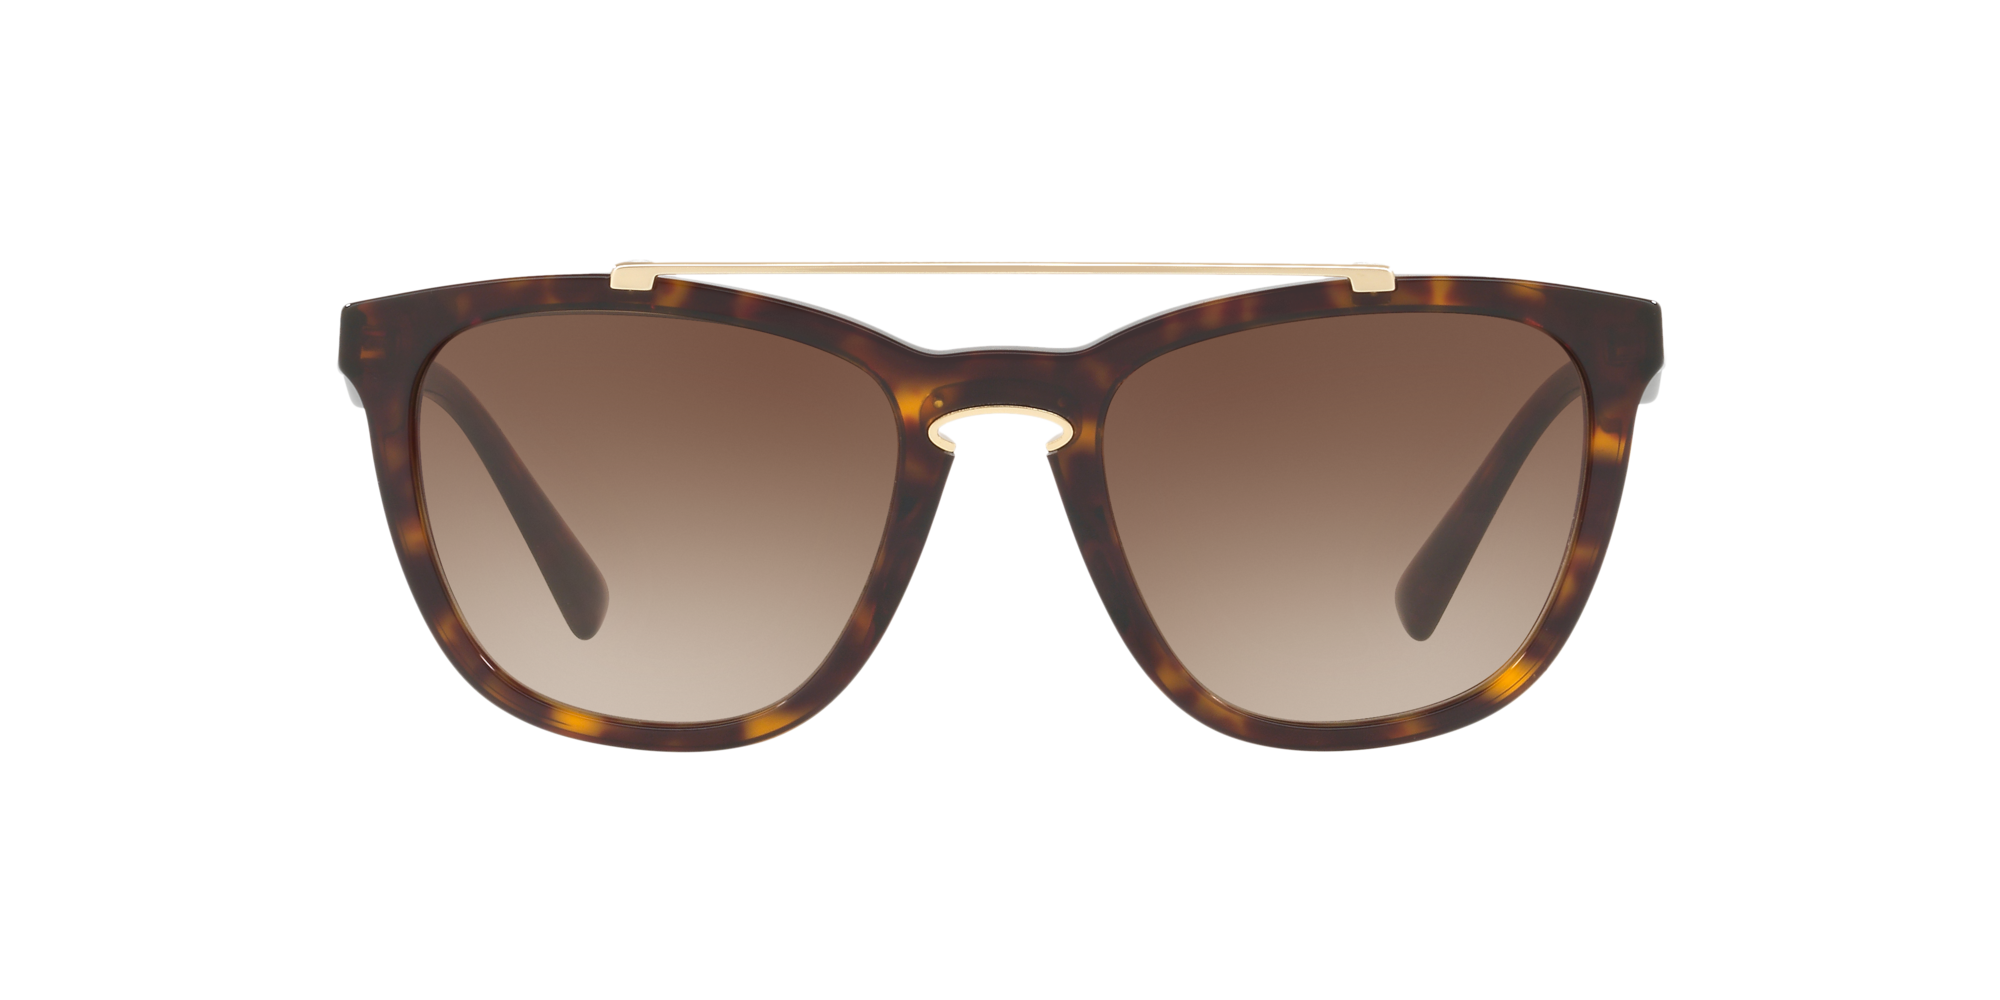 Image for VA4002 54 from LensCrafters | Glasses, Prescription Glasses Online, Eyewear